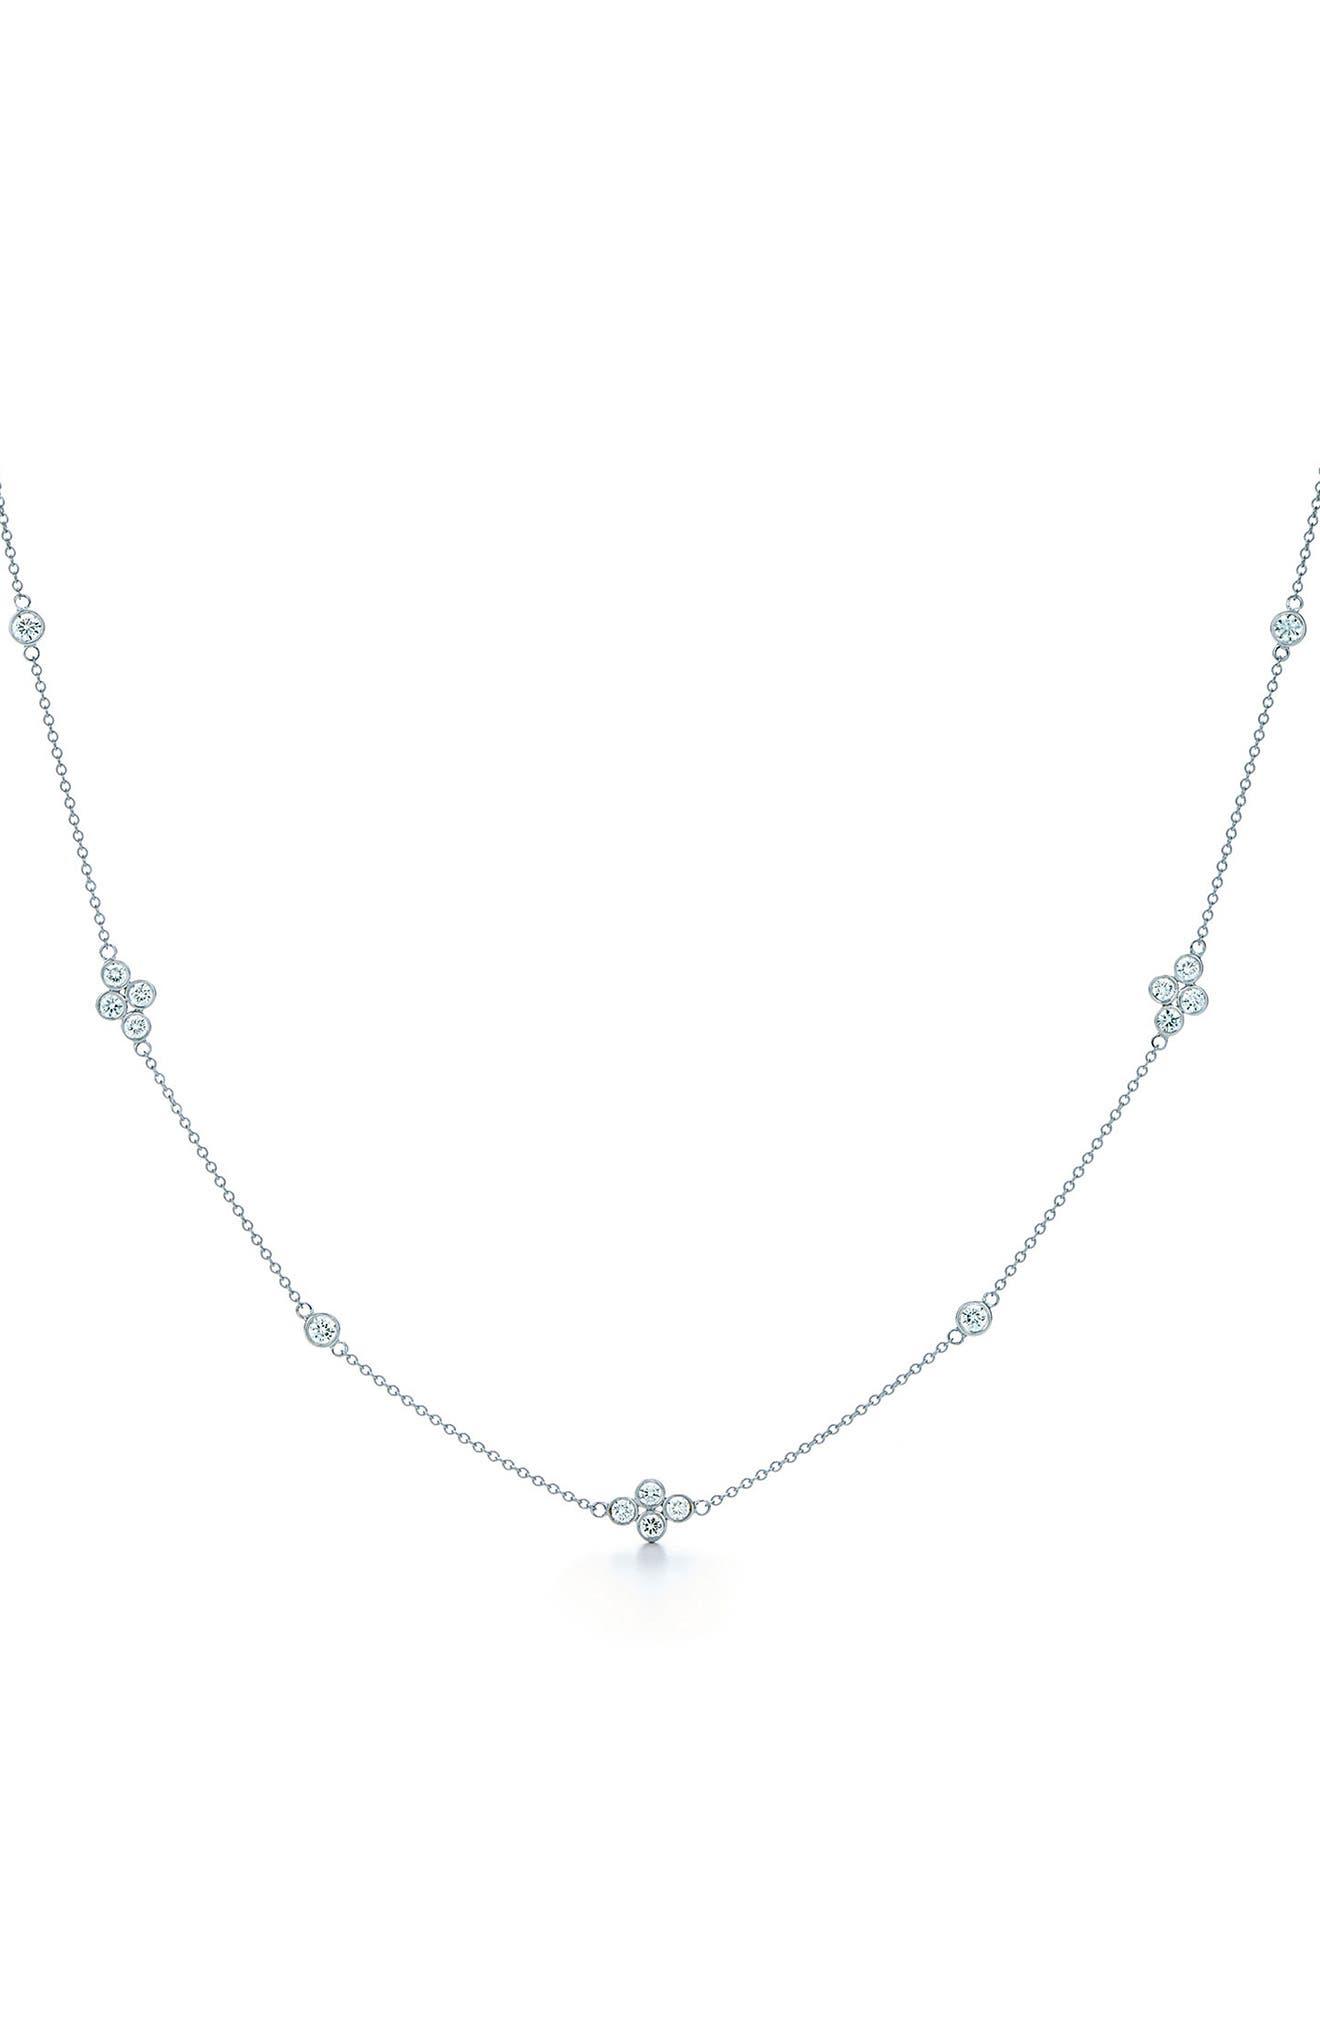 Alternate Image 1 Selected - Kwiat Diamond Collar Necklace